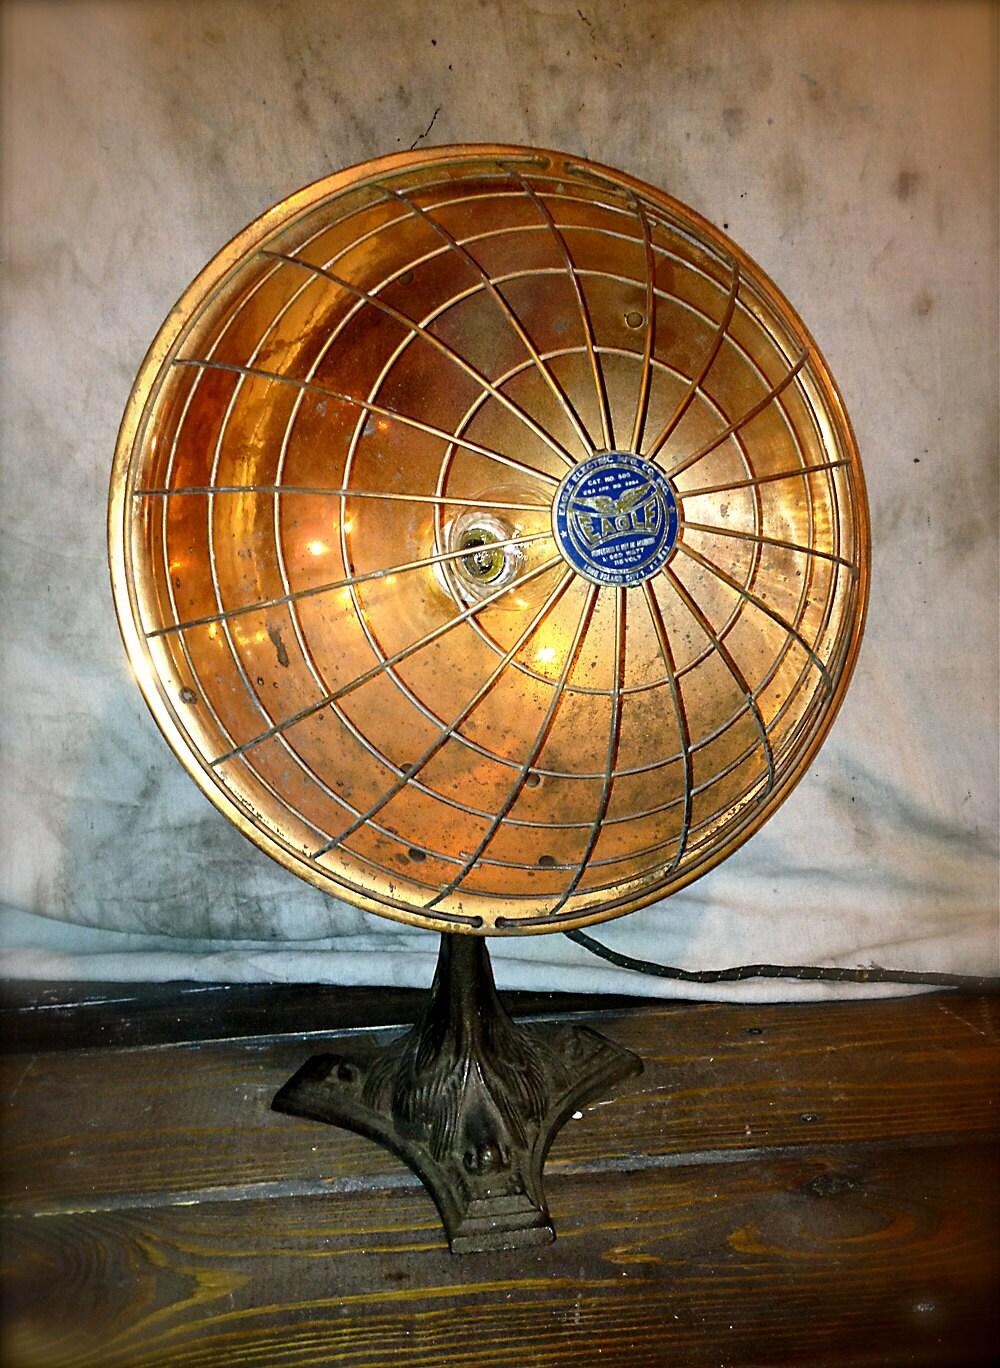 Vintage Copper Table Lamp Radiant Heater 1920s Repurposed